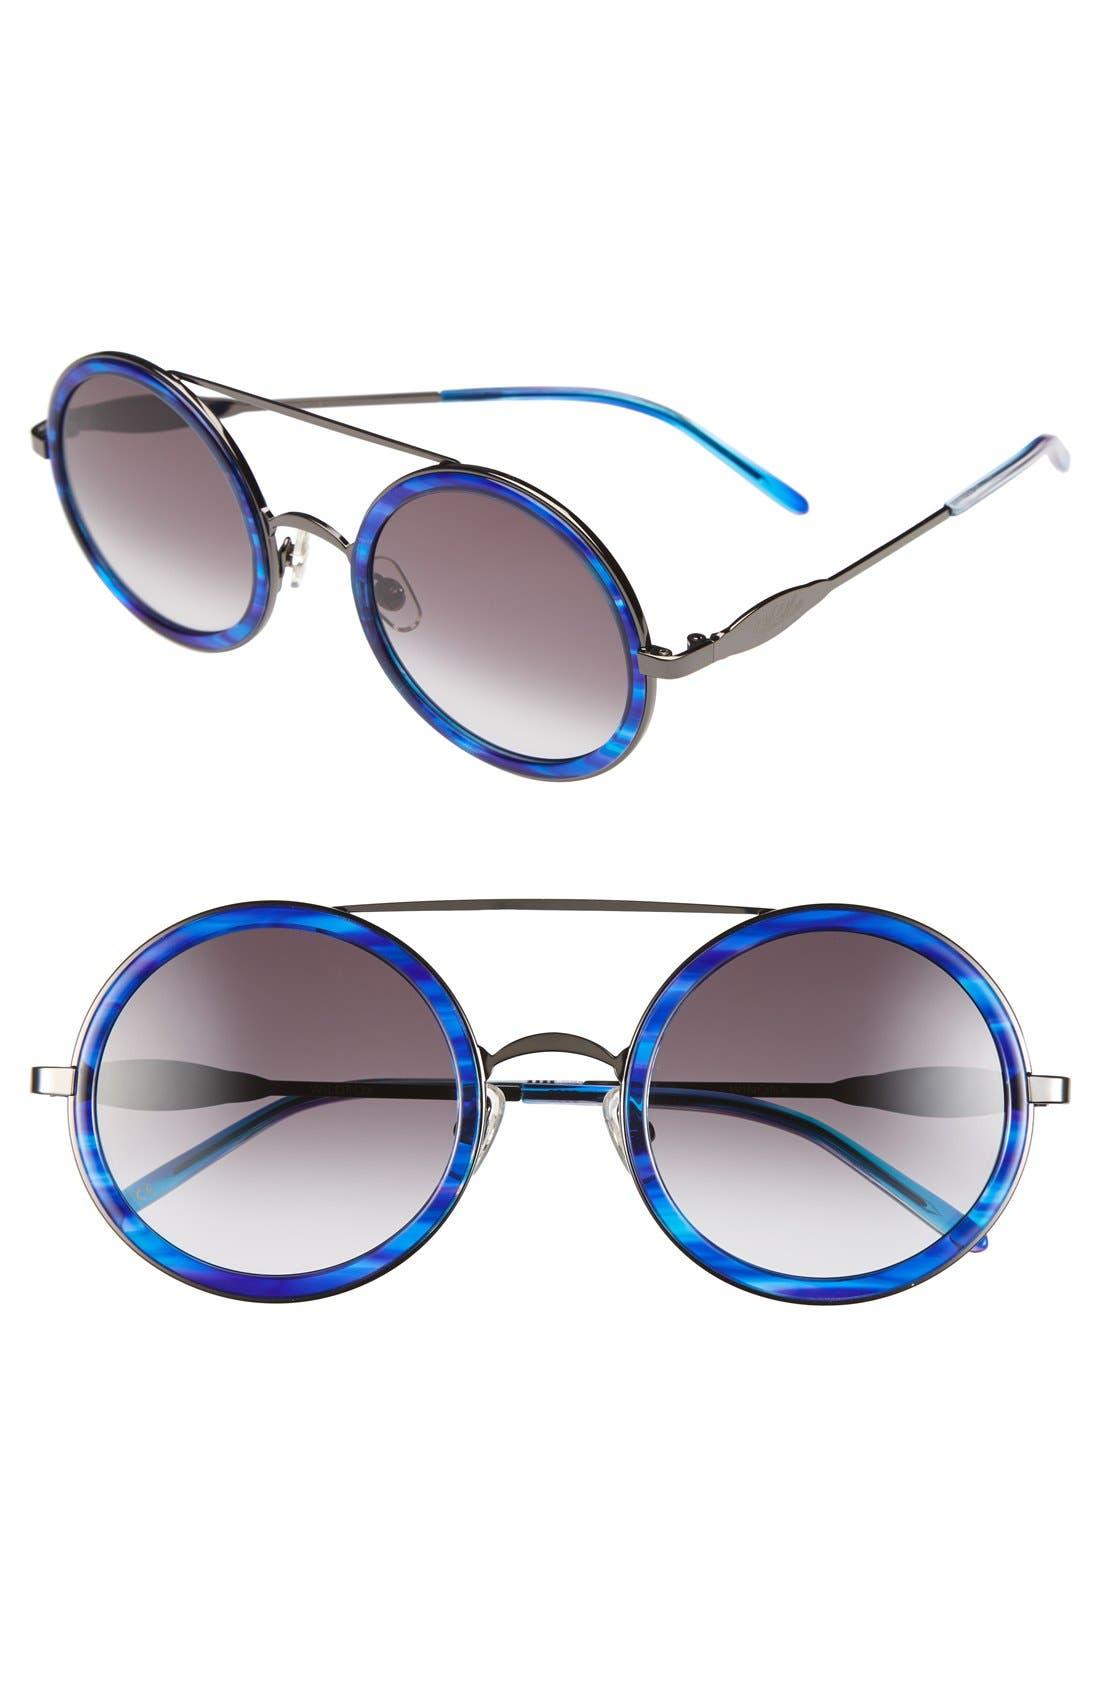 Main Image - Wildfox 'Winona' 56mm Sunglasses